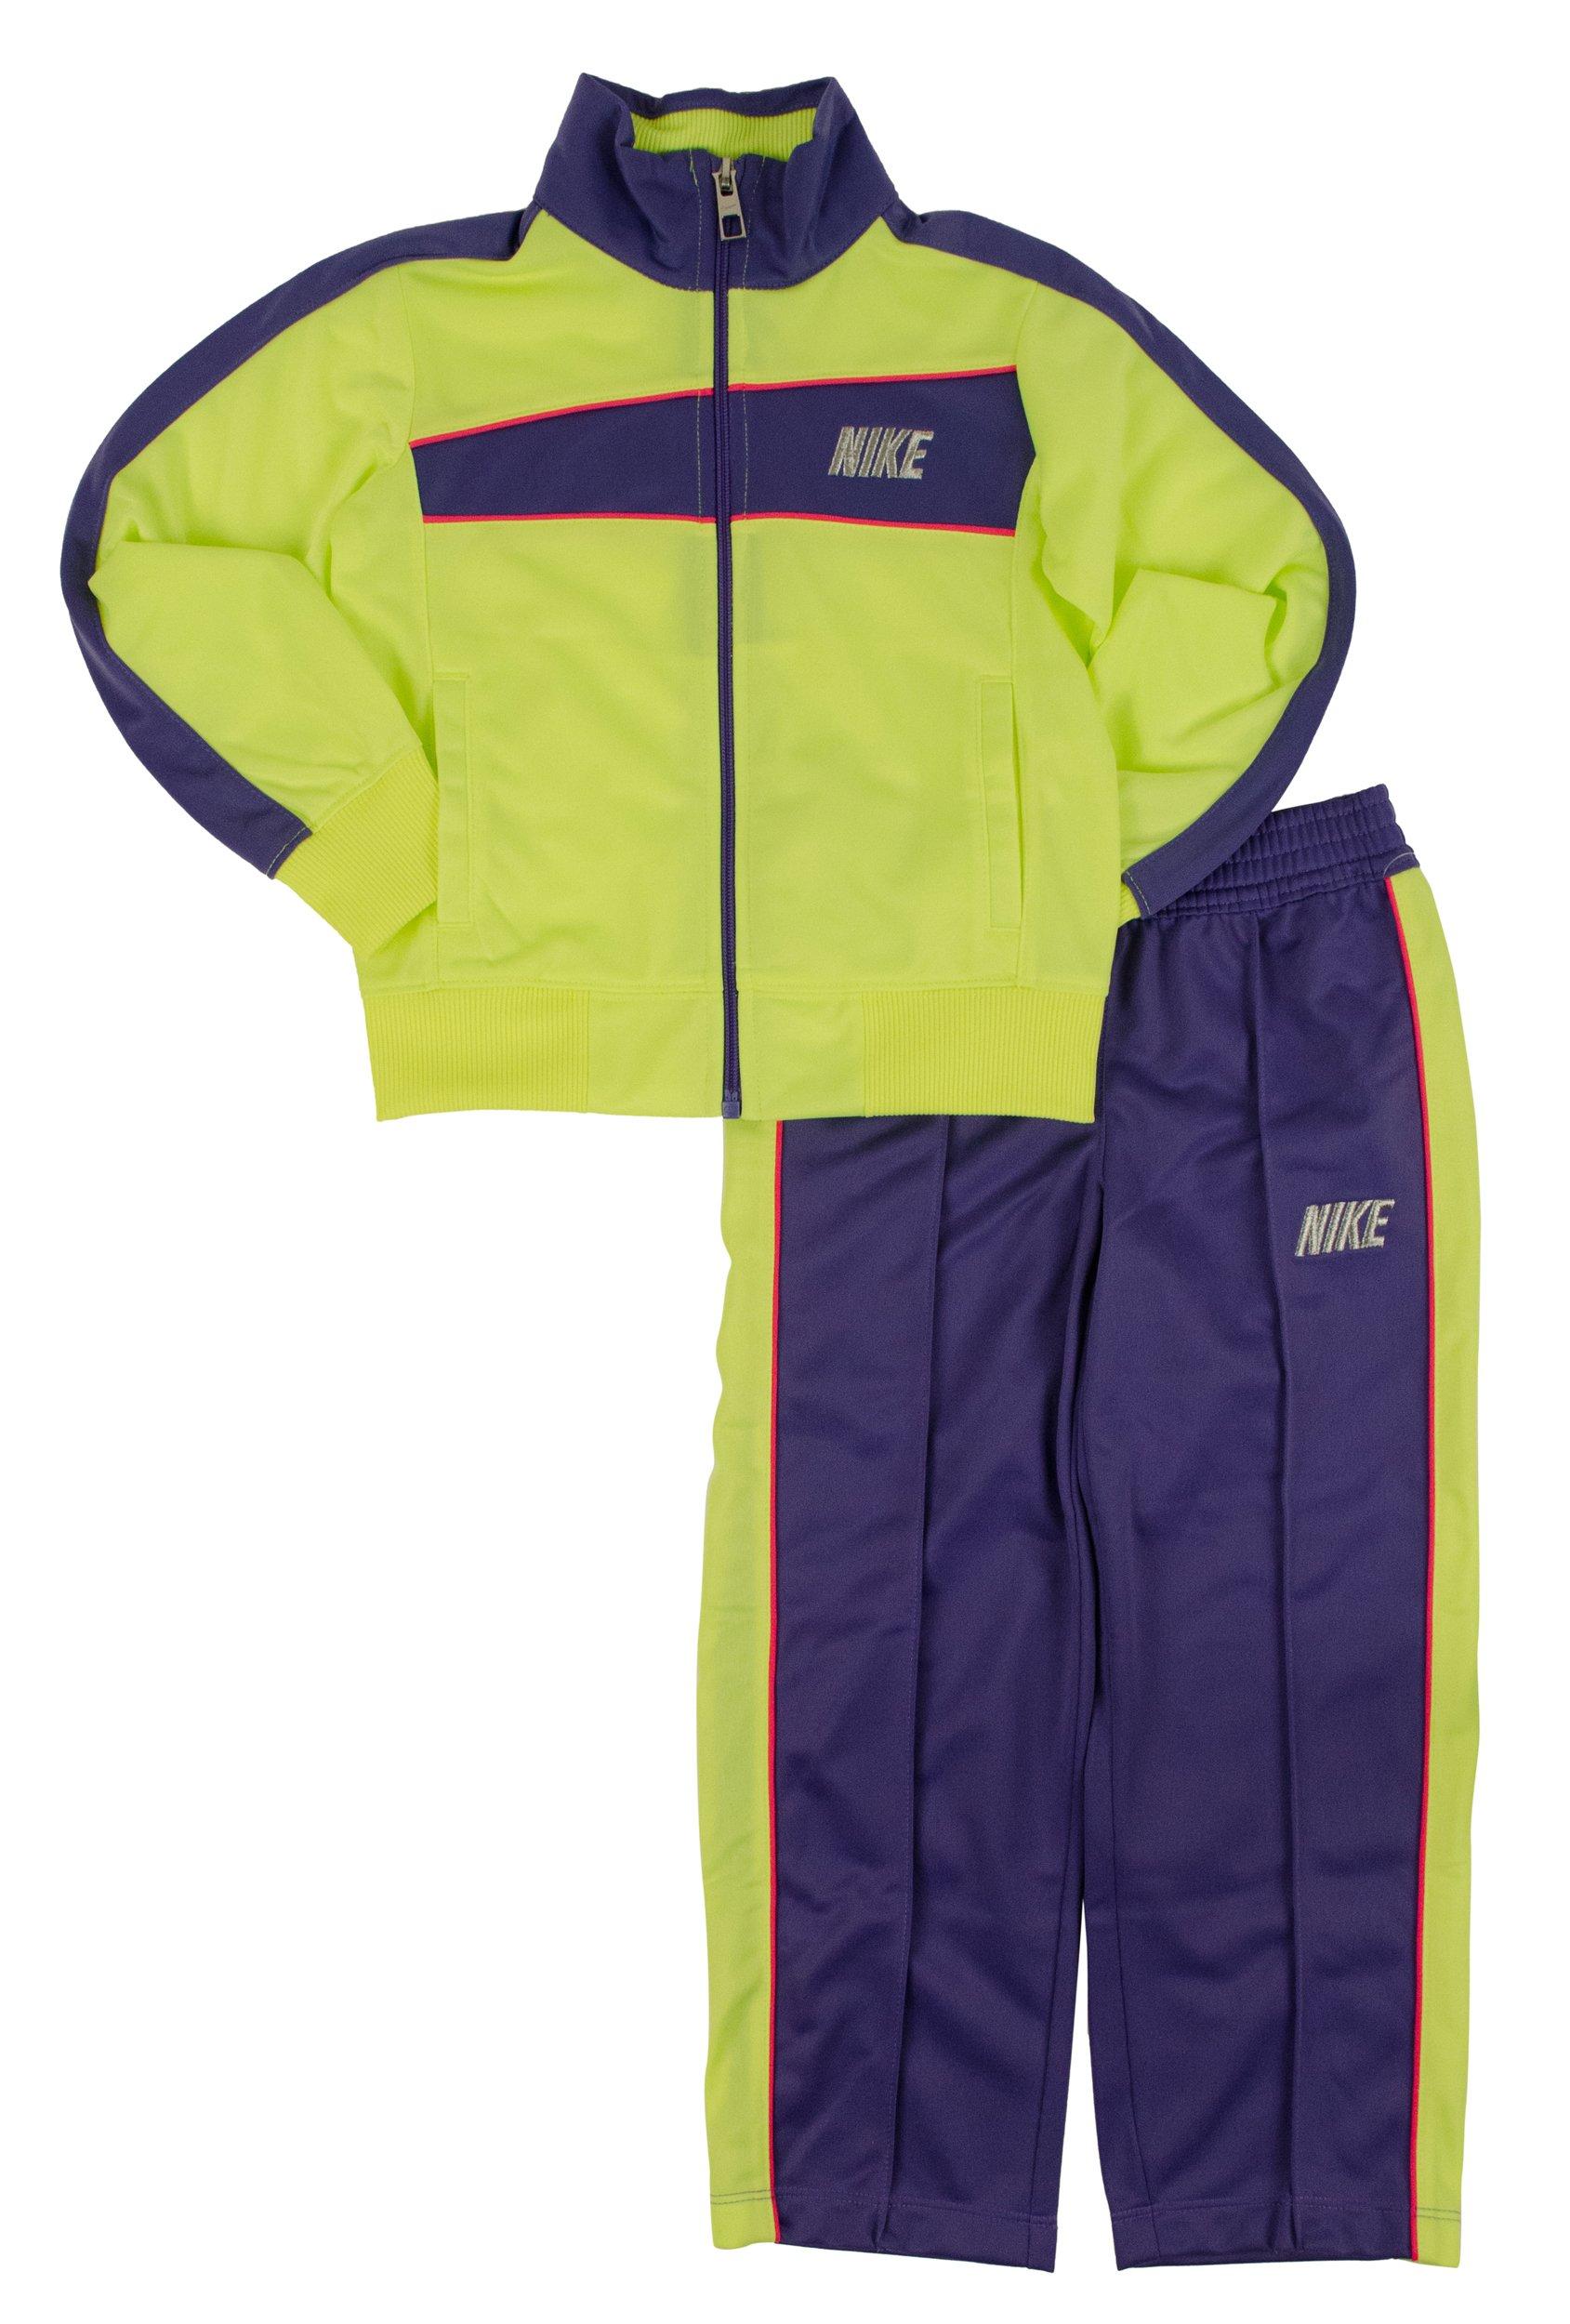 Nike Girls' 2-Piece Colorblocked Tricot Jacket & Pants Set, Purple Haze, 4 by Nike